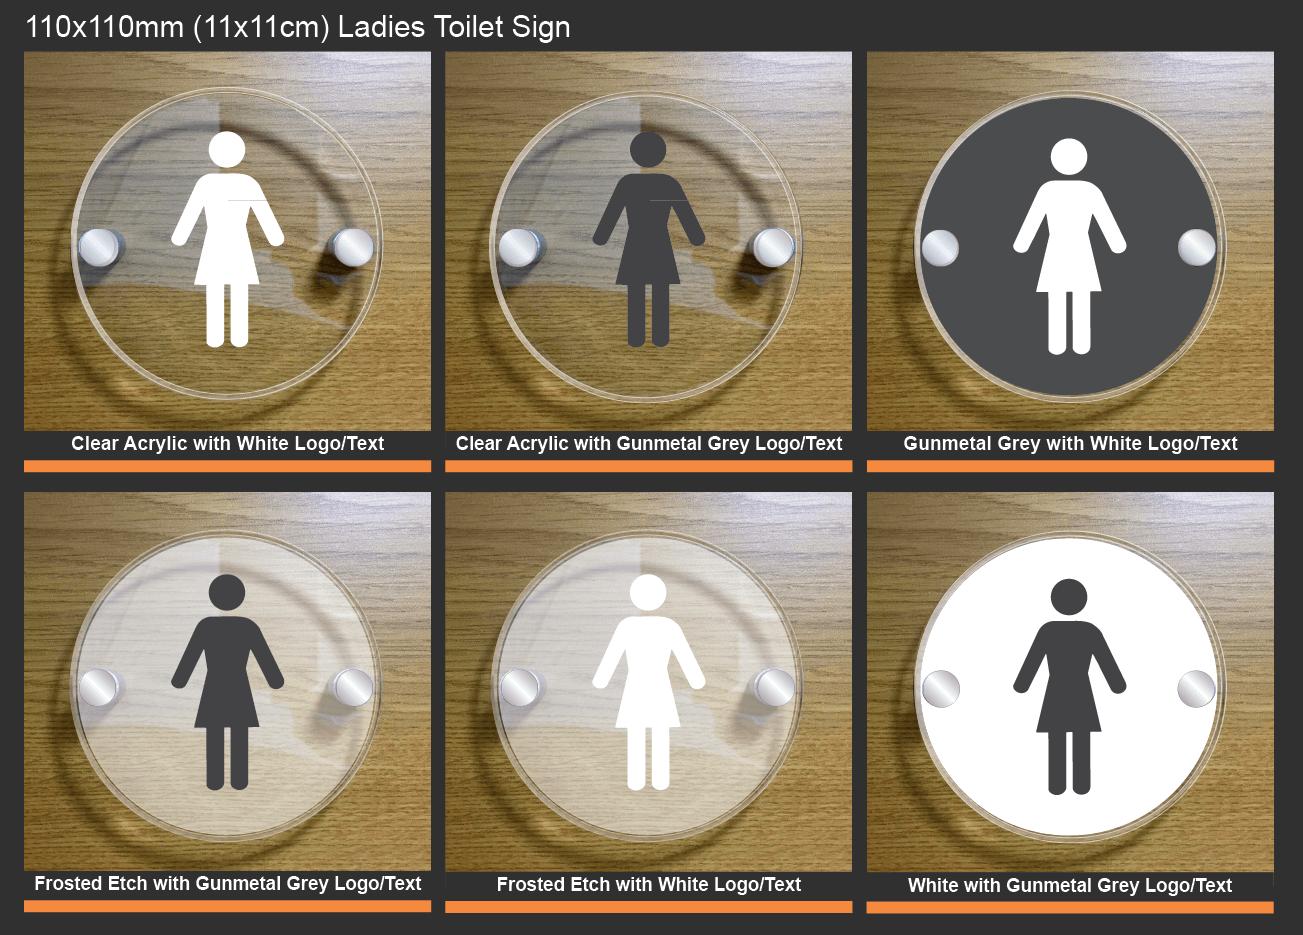 Ladies Toilet Signs - Acrylic Ladies Toilet Sign